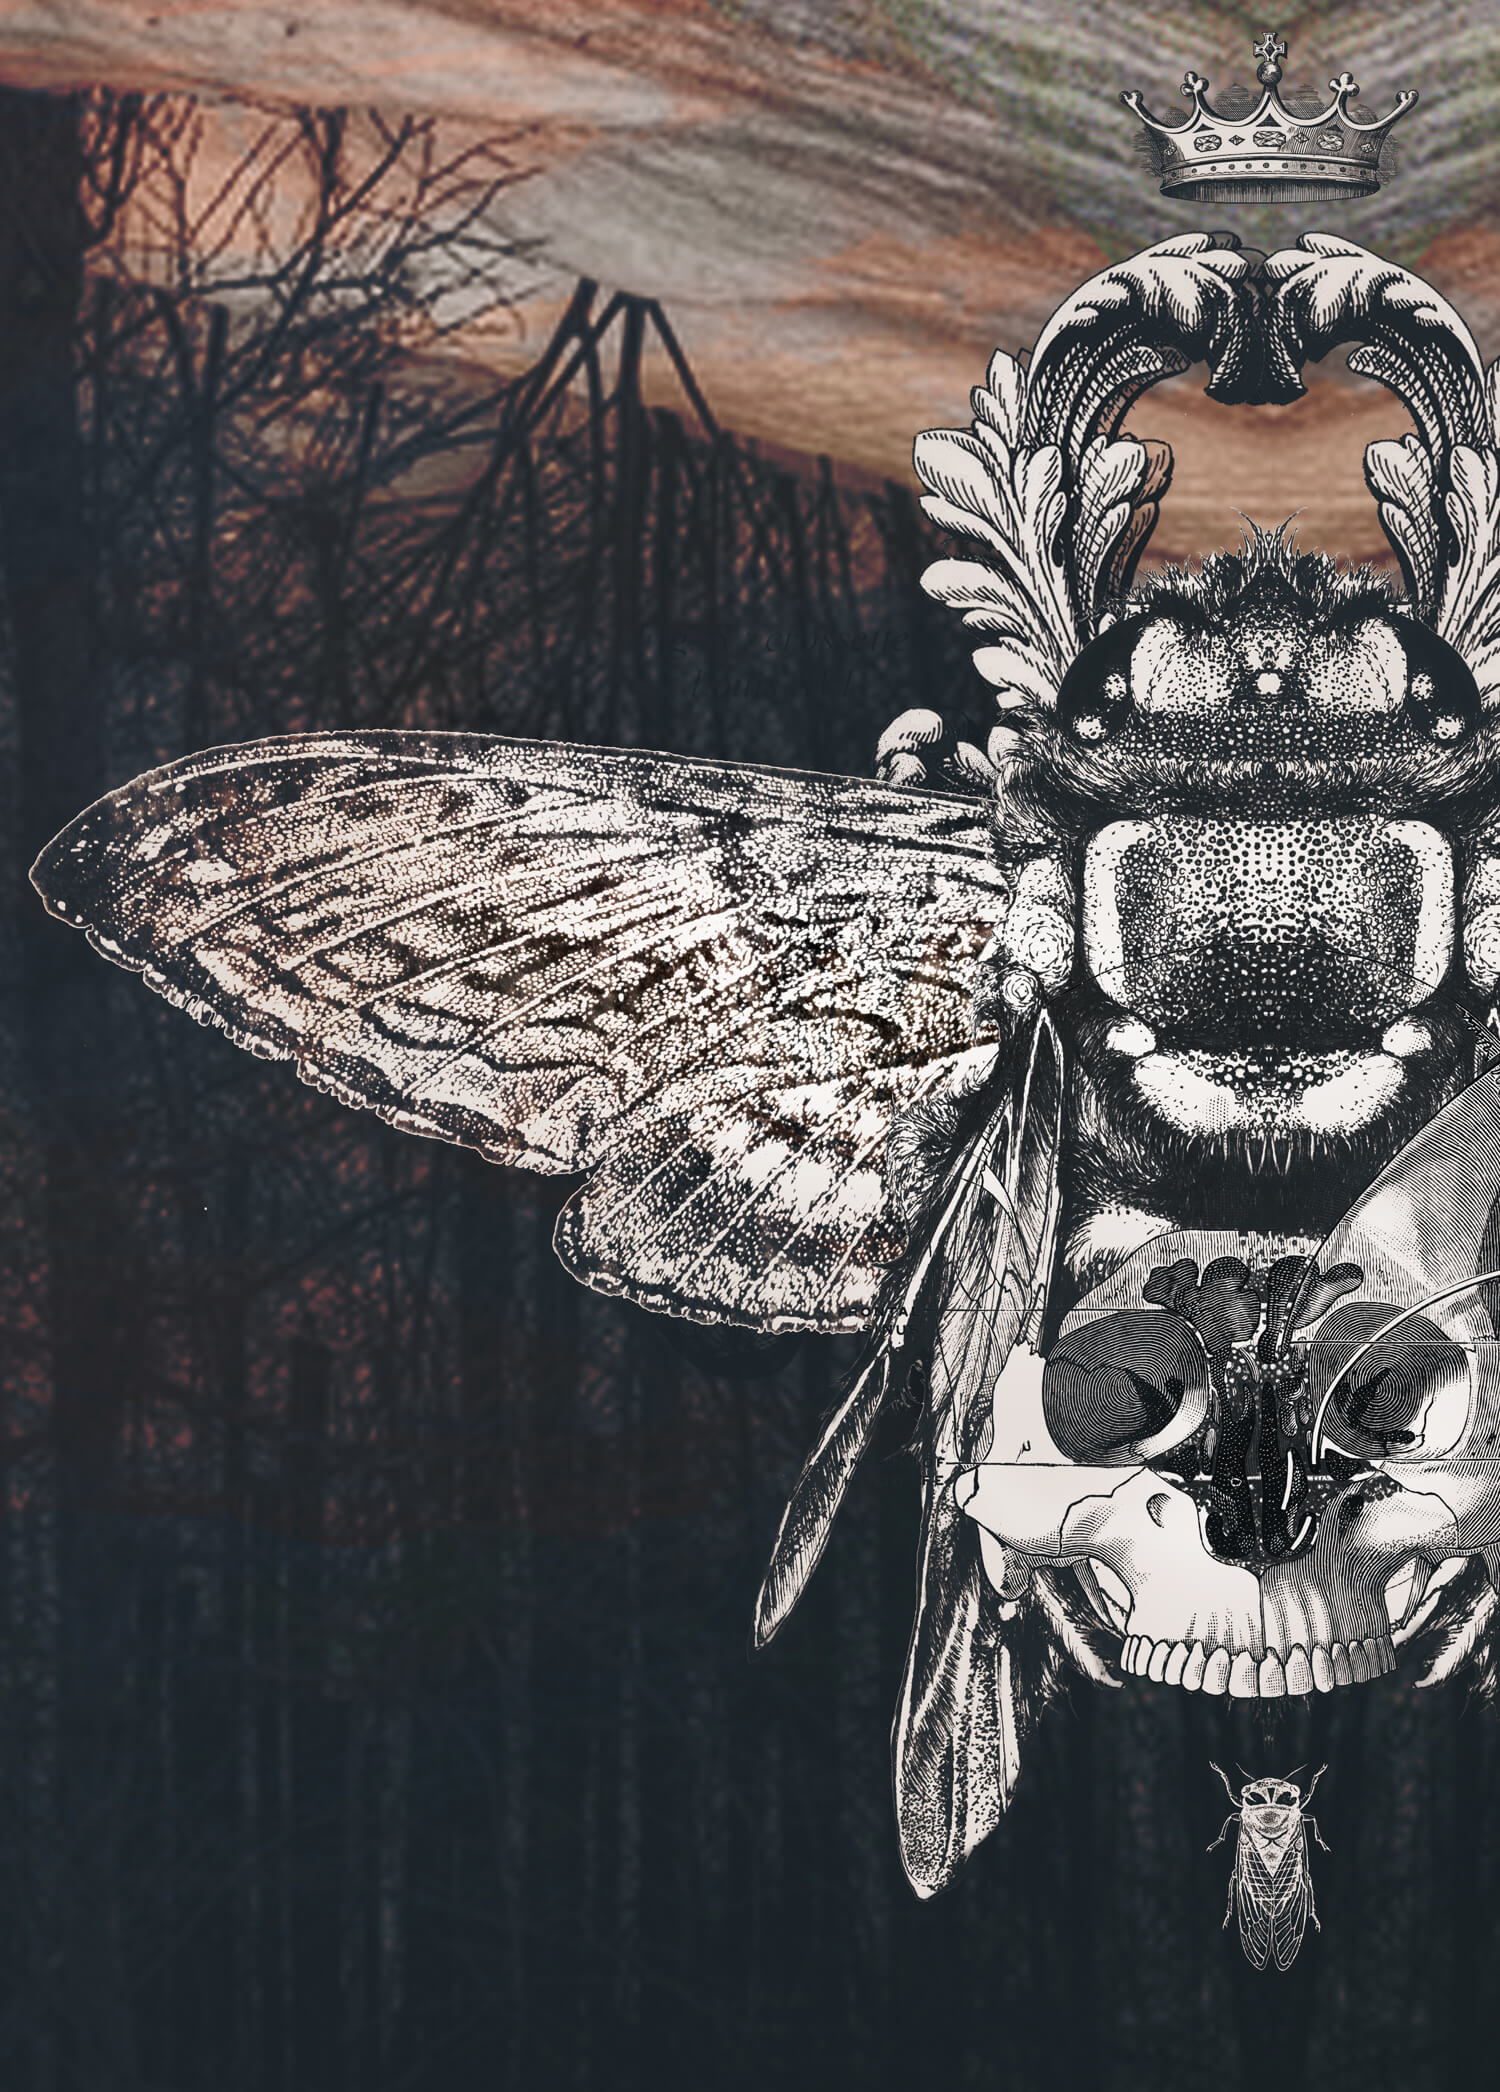 olga_mulica_forest_moth_2